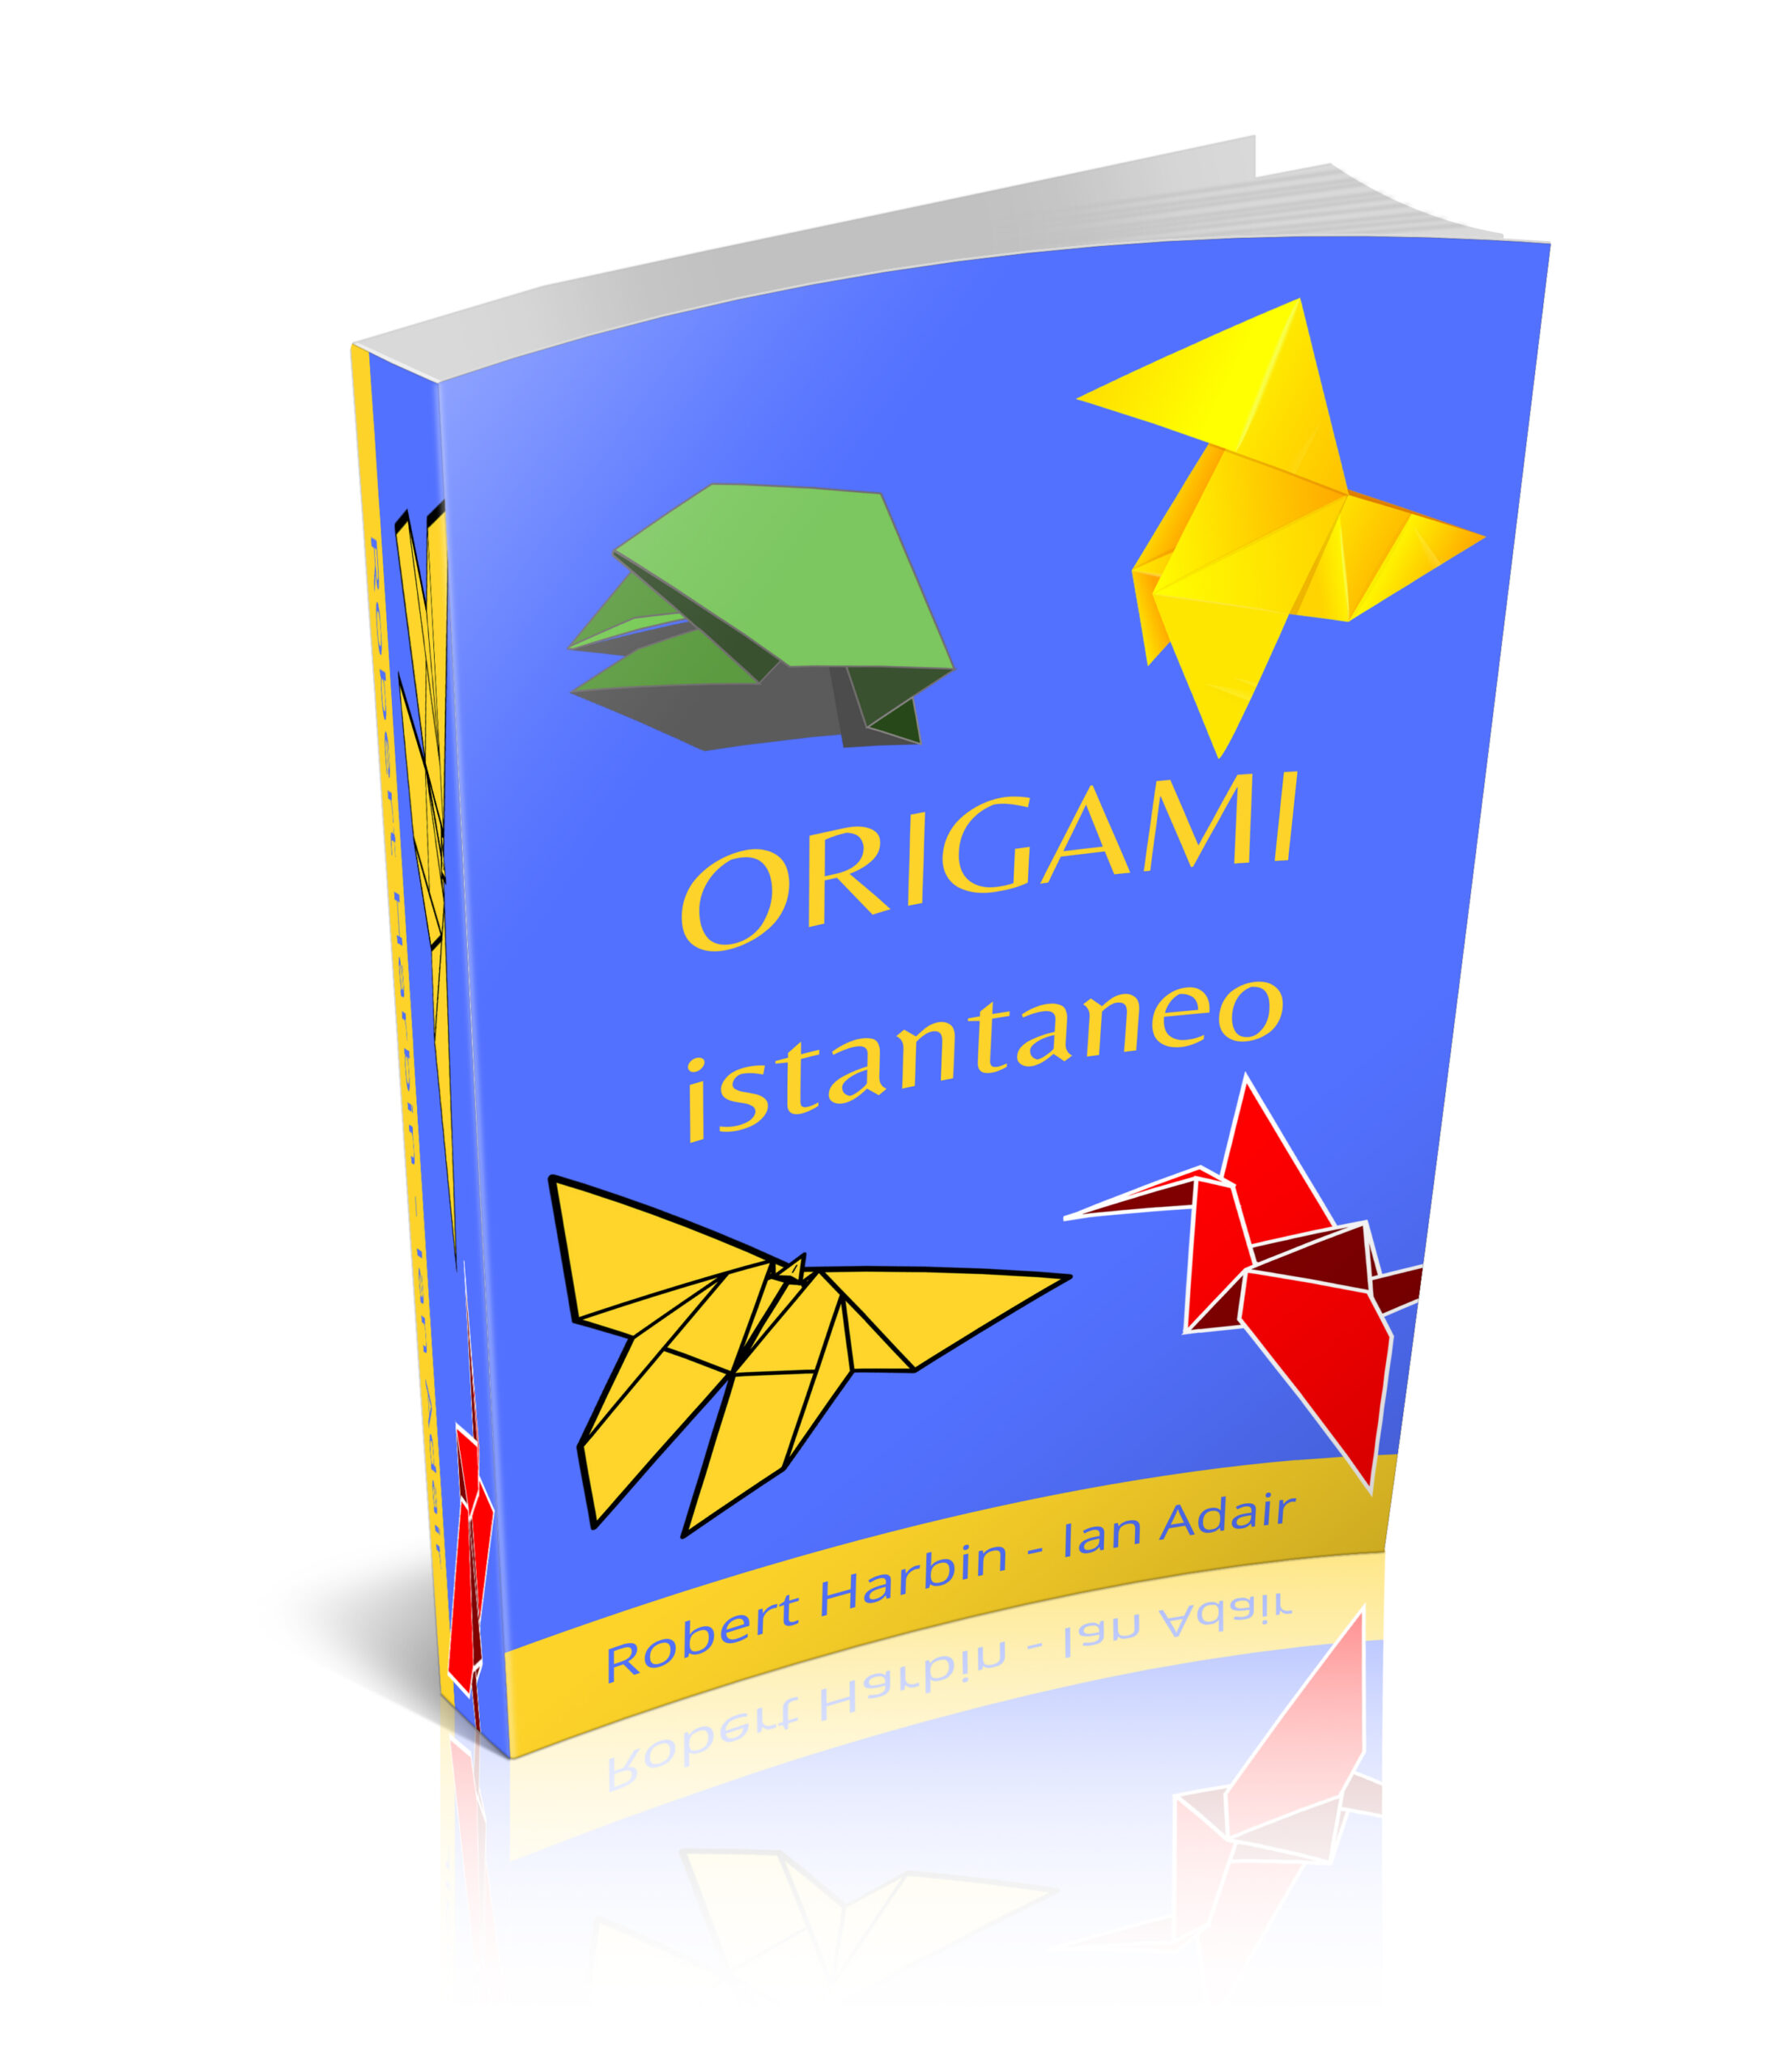 Origami Istantaneo